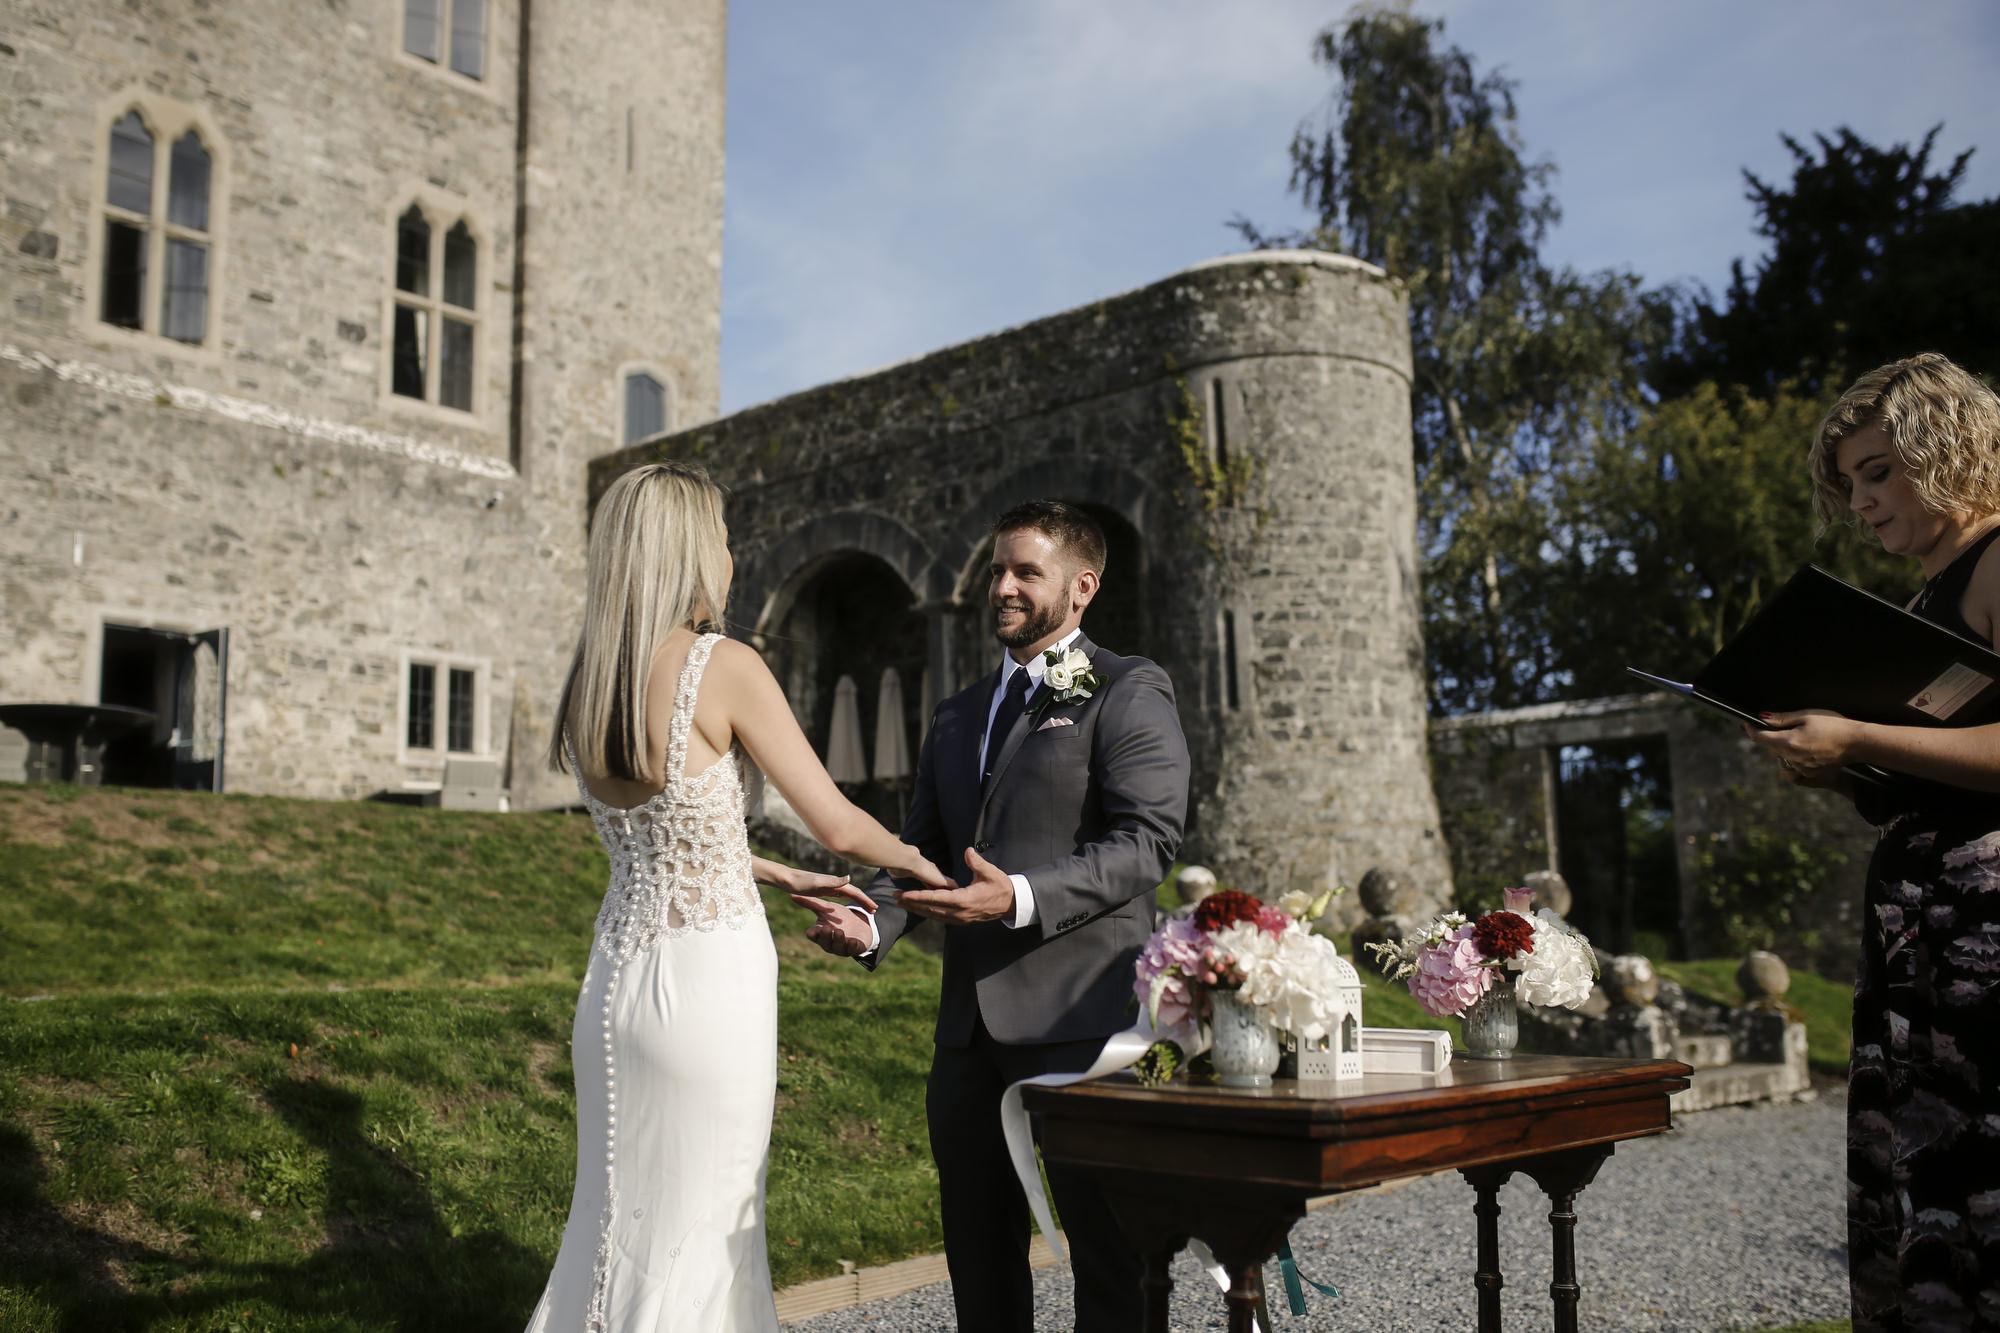 kilkea_castle_wedding_photographer_goldenmoments_029.jpg